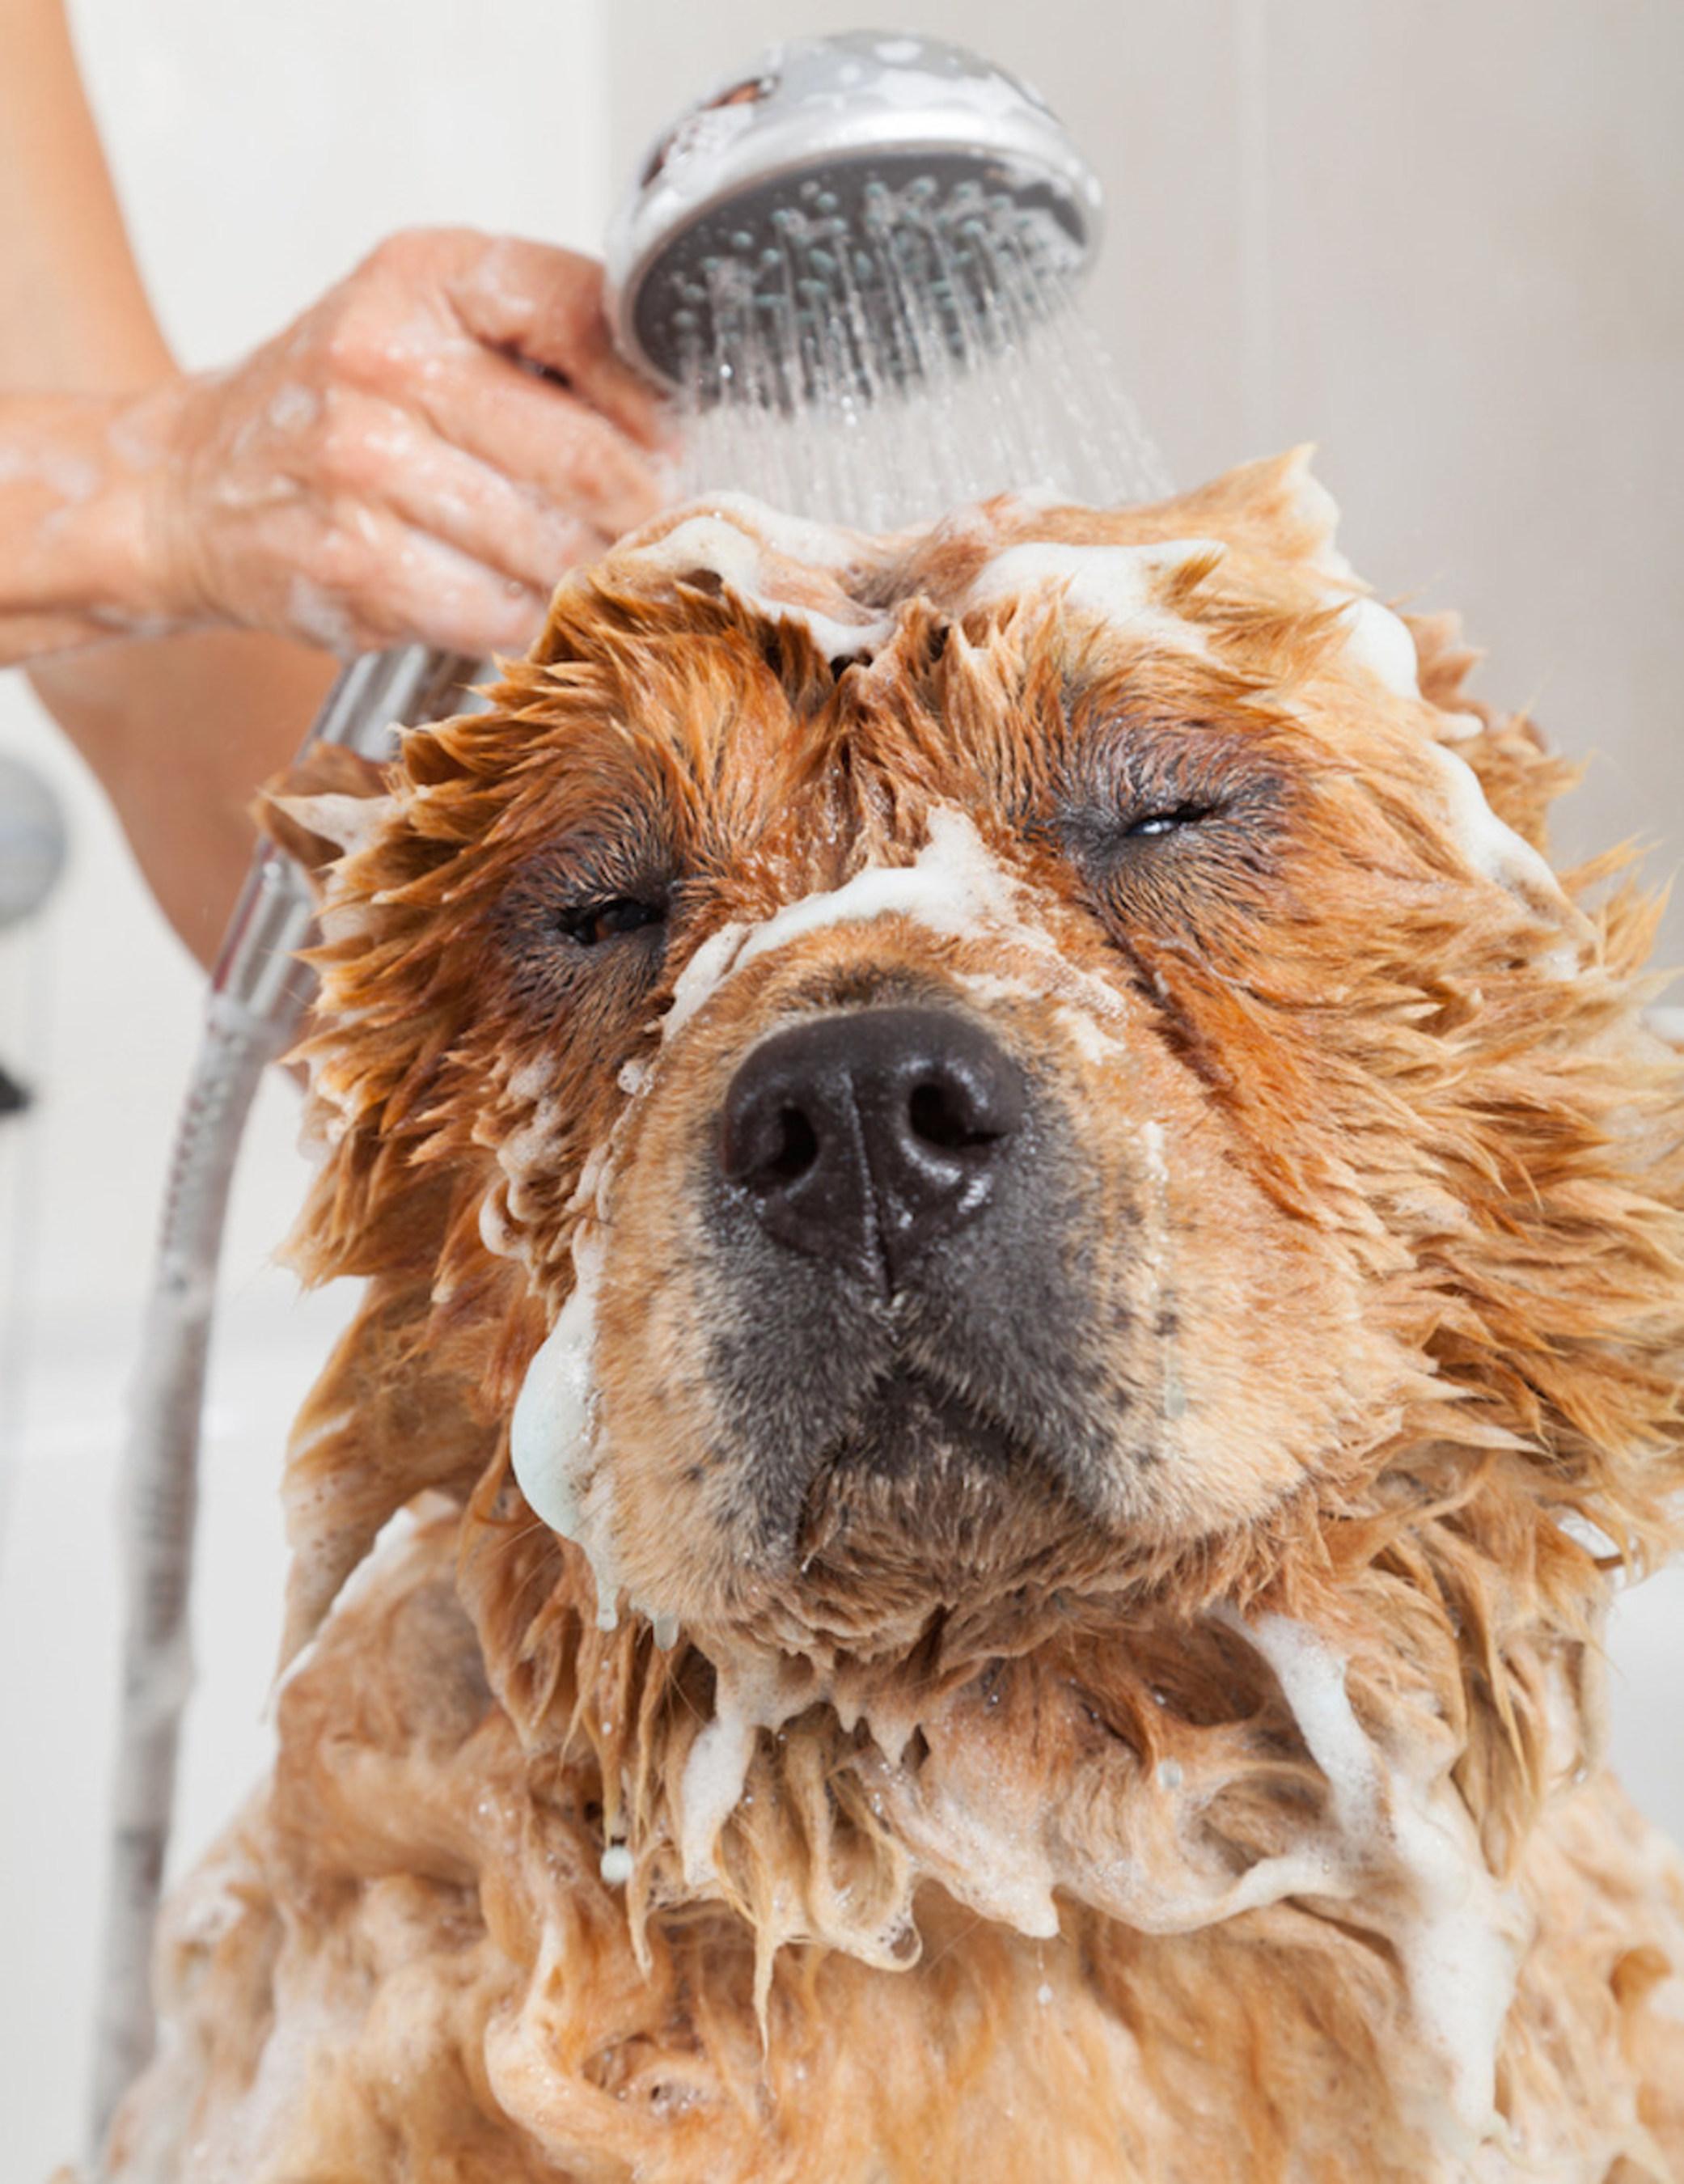 Don't skip wintertime baths